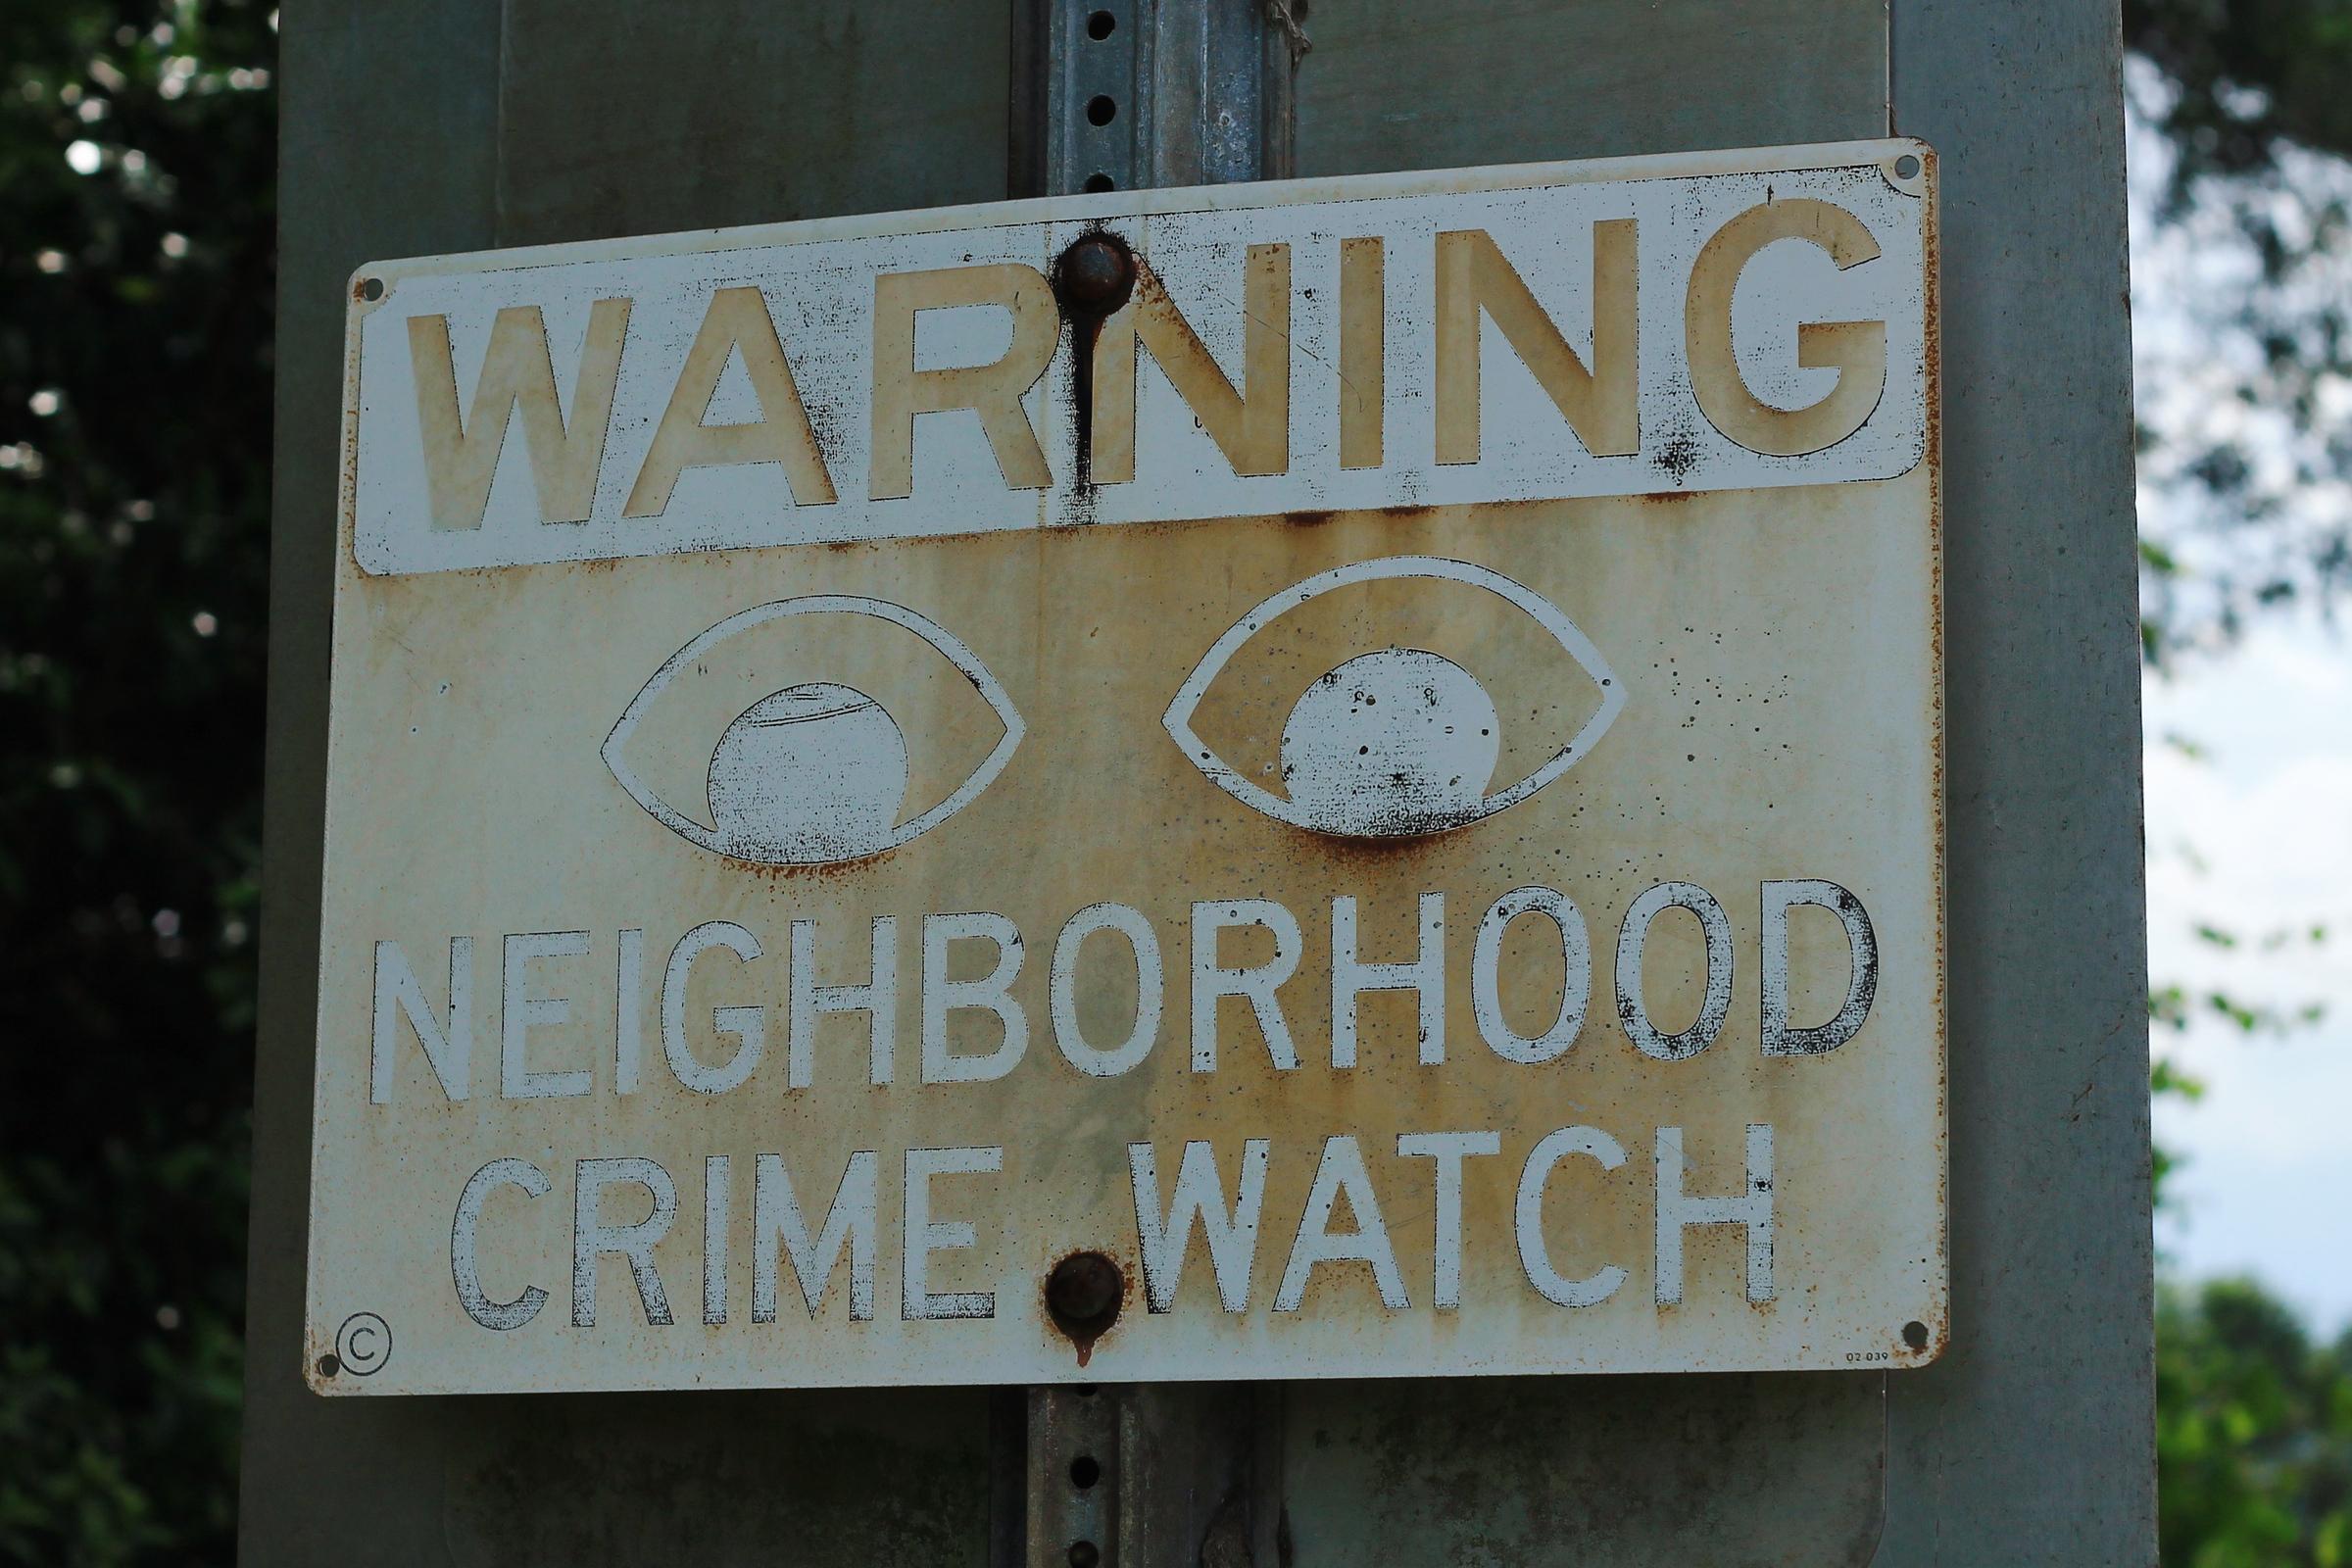 Fileneighborhood Crime Watch Sign 28350368487jpg Wikimedia Commons